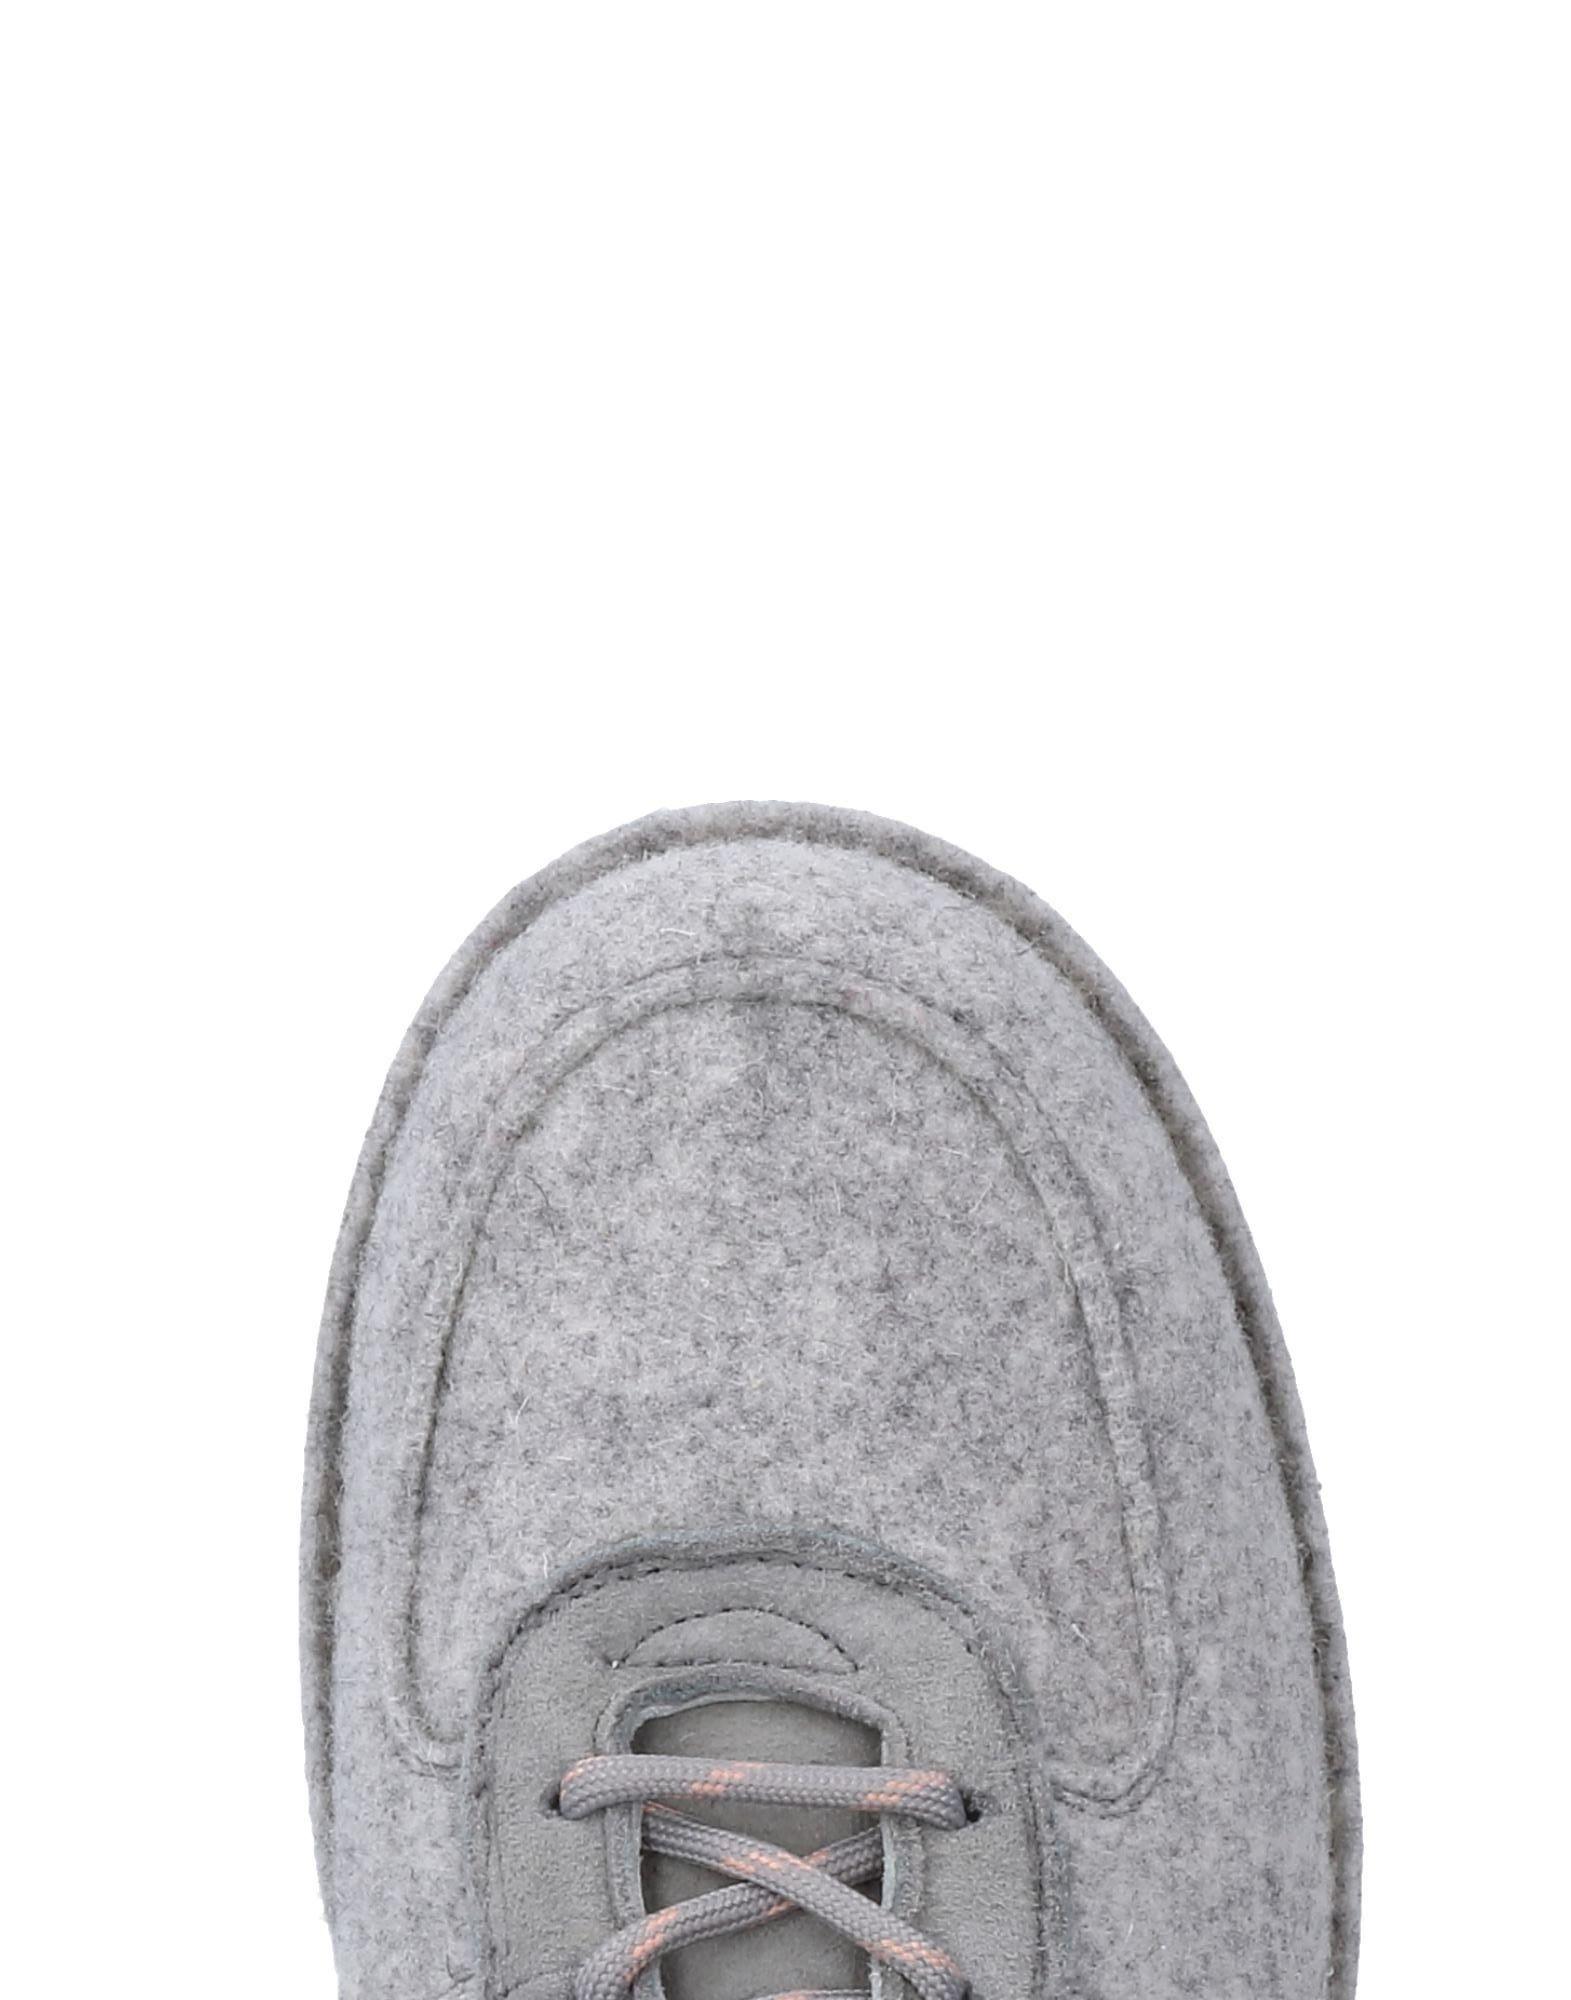 9676ad55b73d5 ... Diemme Herren Sneakers Herren Diemme 11507387AX Gute Qualität beliebte  Schuhe 919857